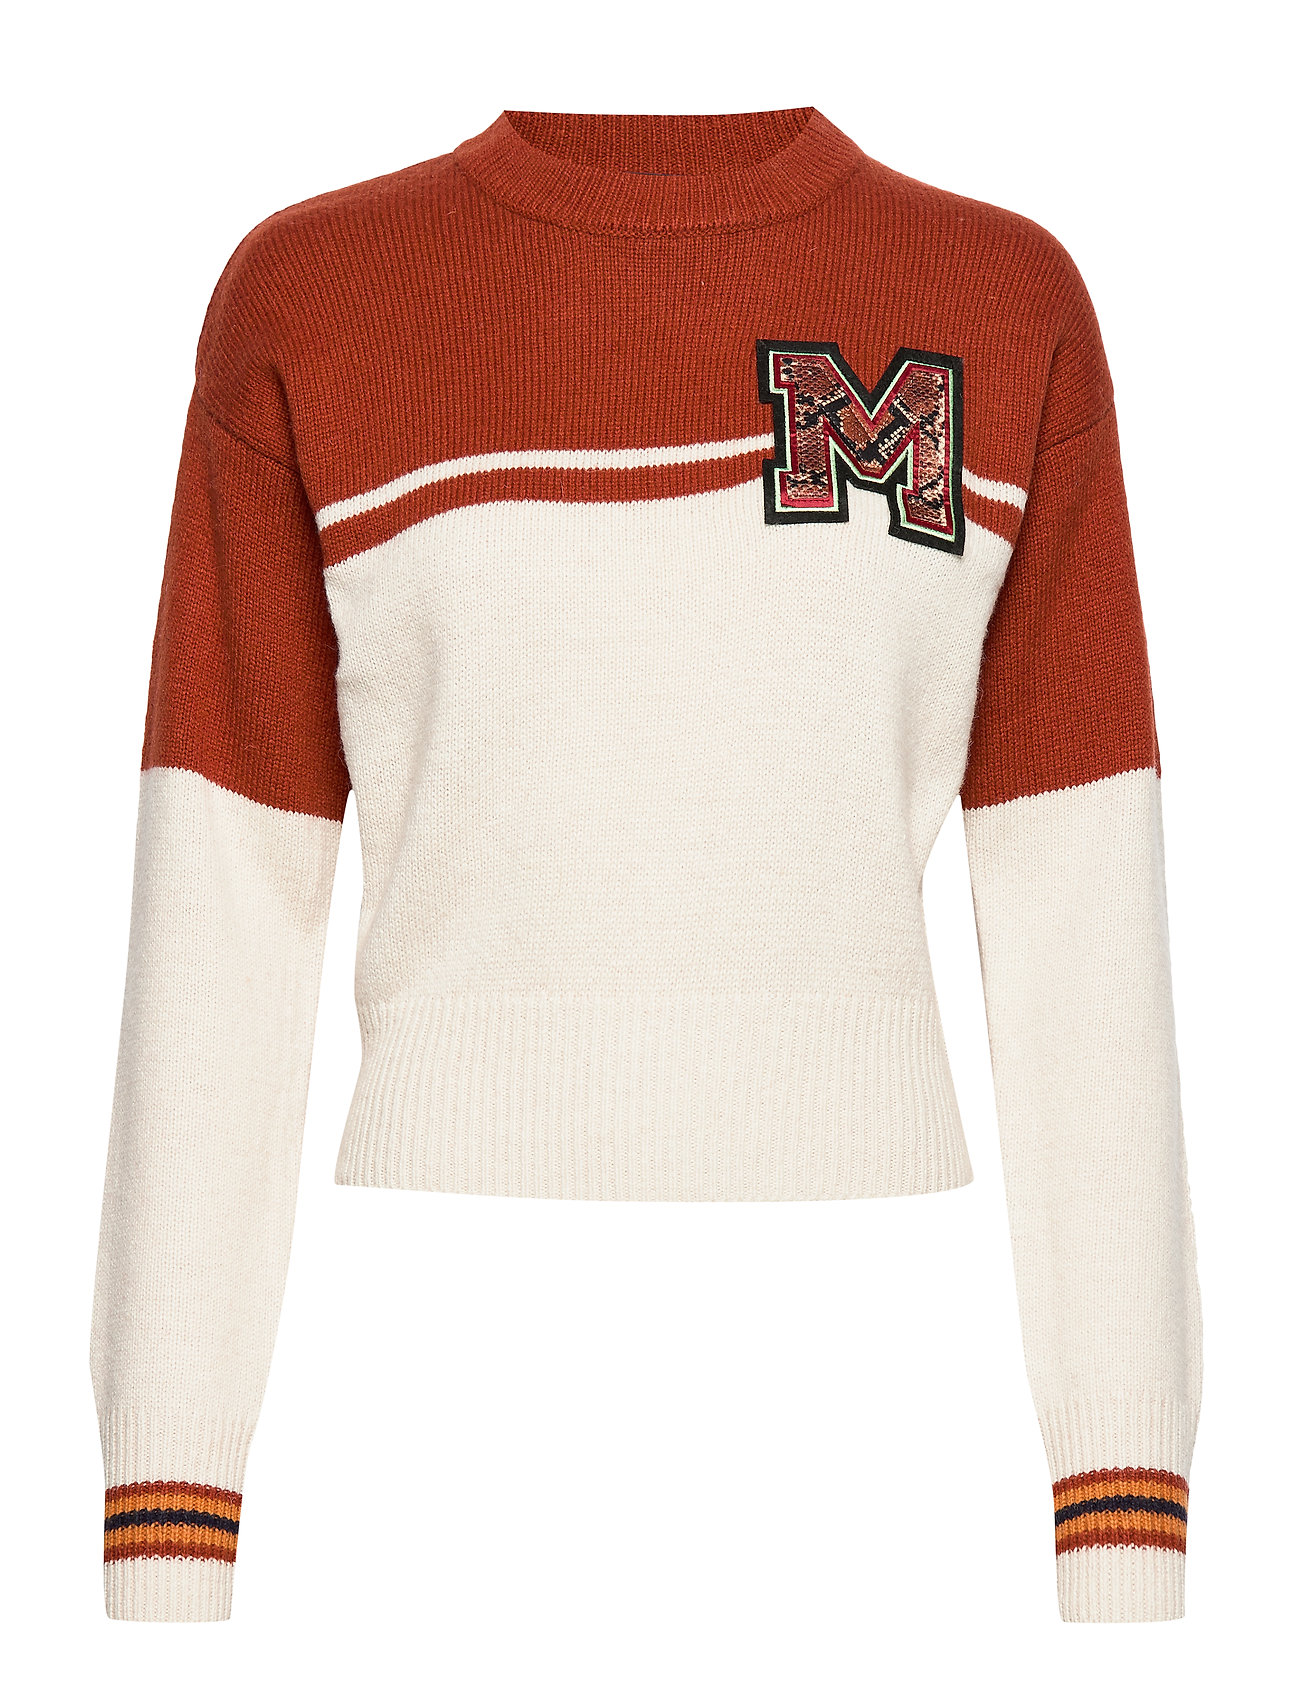 Scotch & Soda Varsity colour block sweater with badge - COMBO A